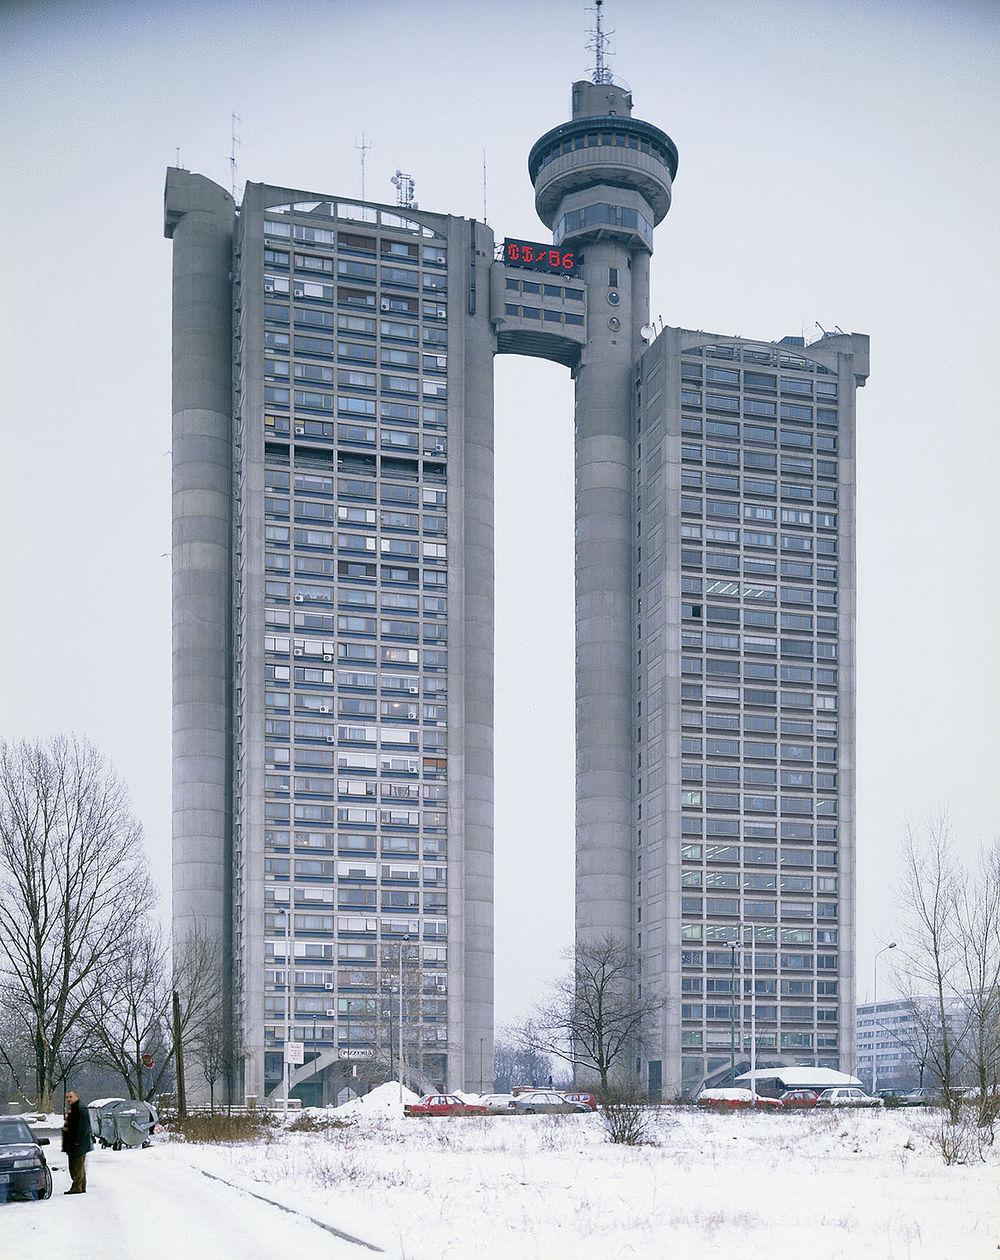 1280px-Jugotours_Beograd_Dec_2003.jpg